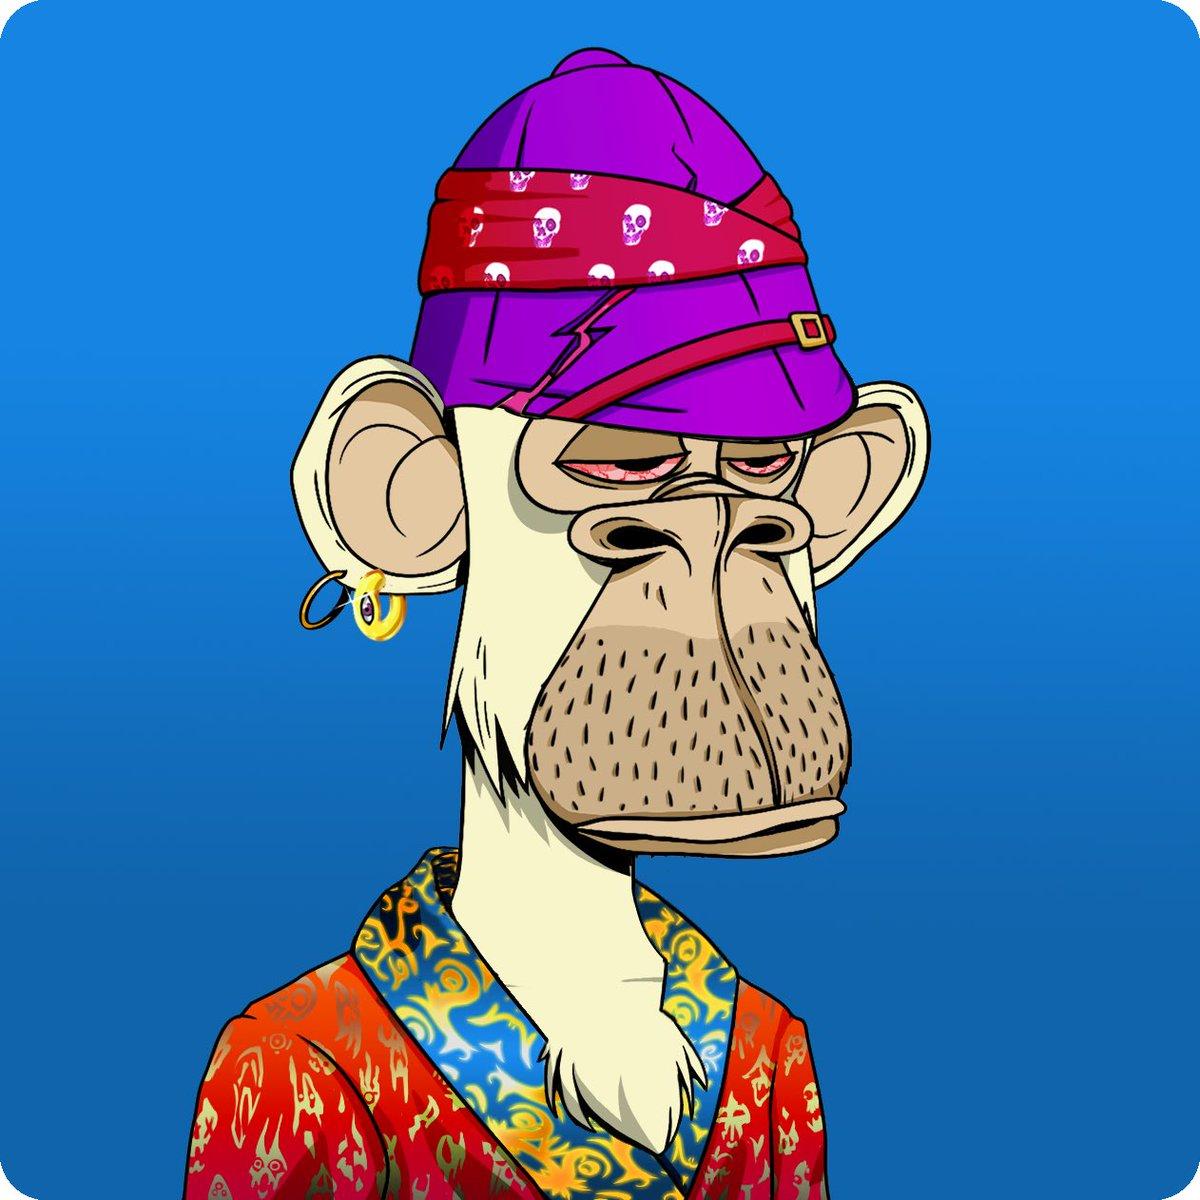 Bored like an Ape, dressed like a Mutant. BAYC x MAYC @BoredApeYC #BAYC #MAYC #NFT